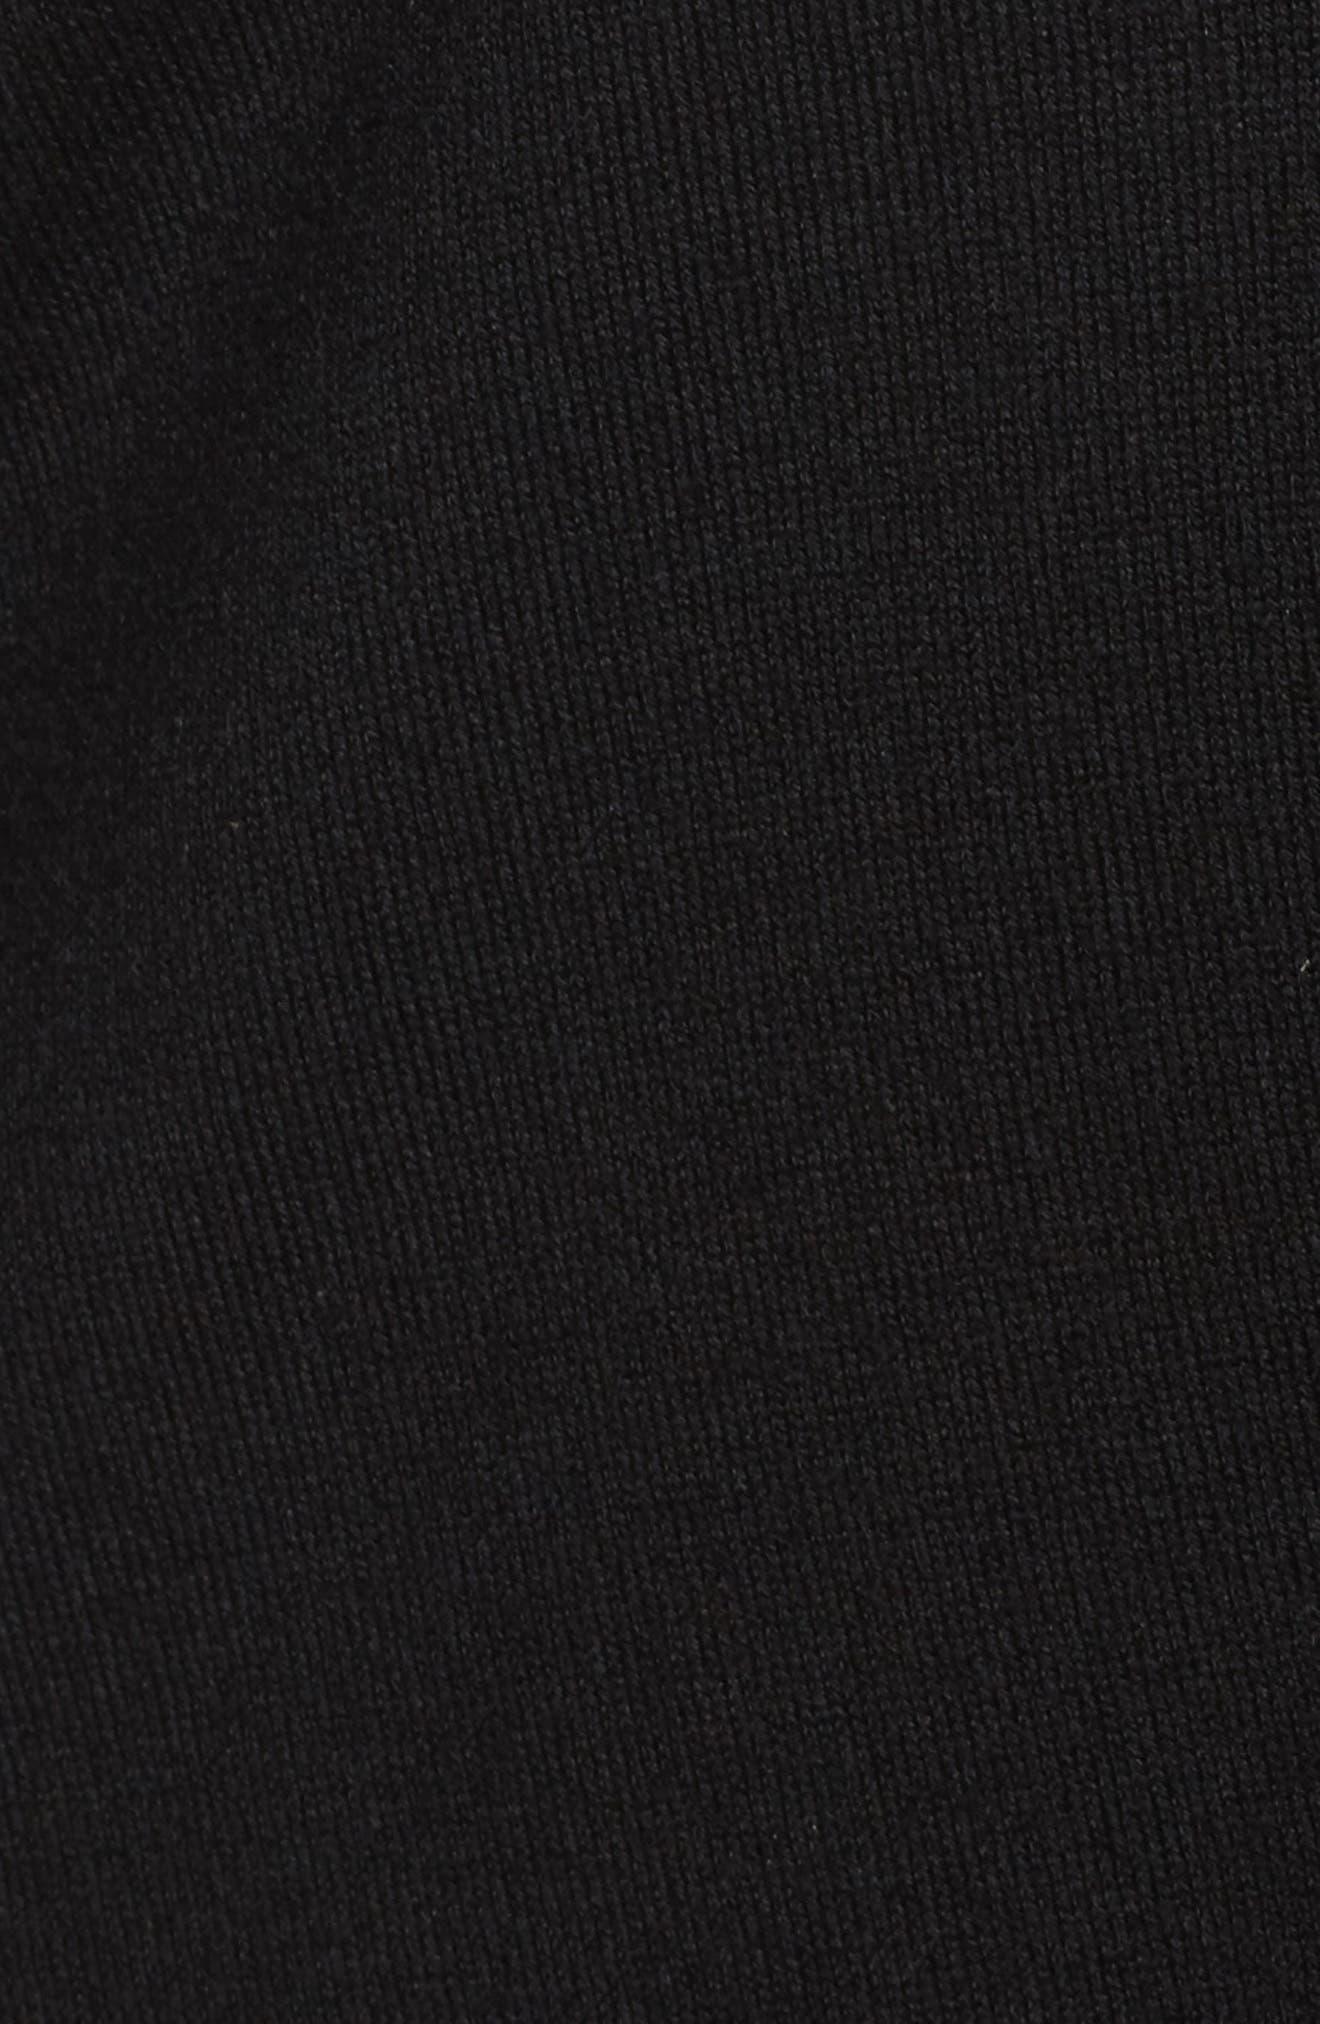 V-Neck Wool Blend Cardigan,                             Alternate thumbnail 5, color,                             001